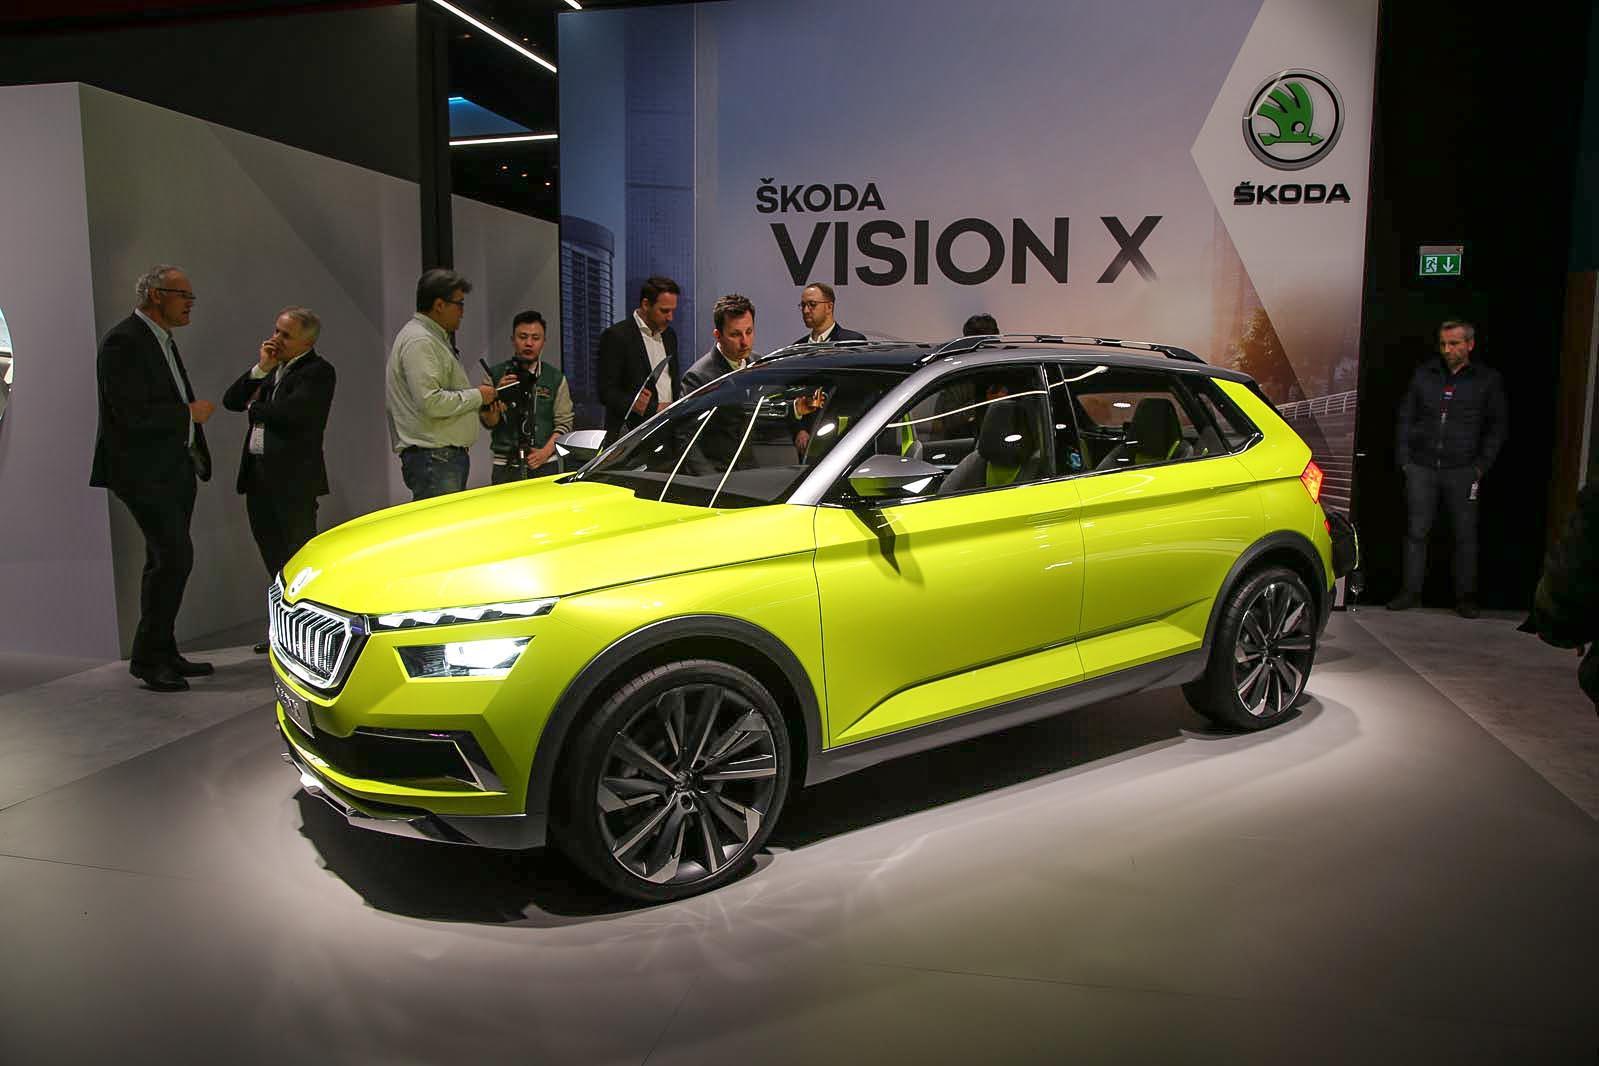 Skoda Vision X concept previews 2019 crossover